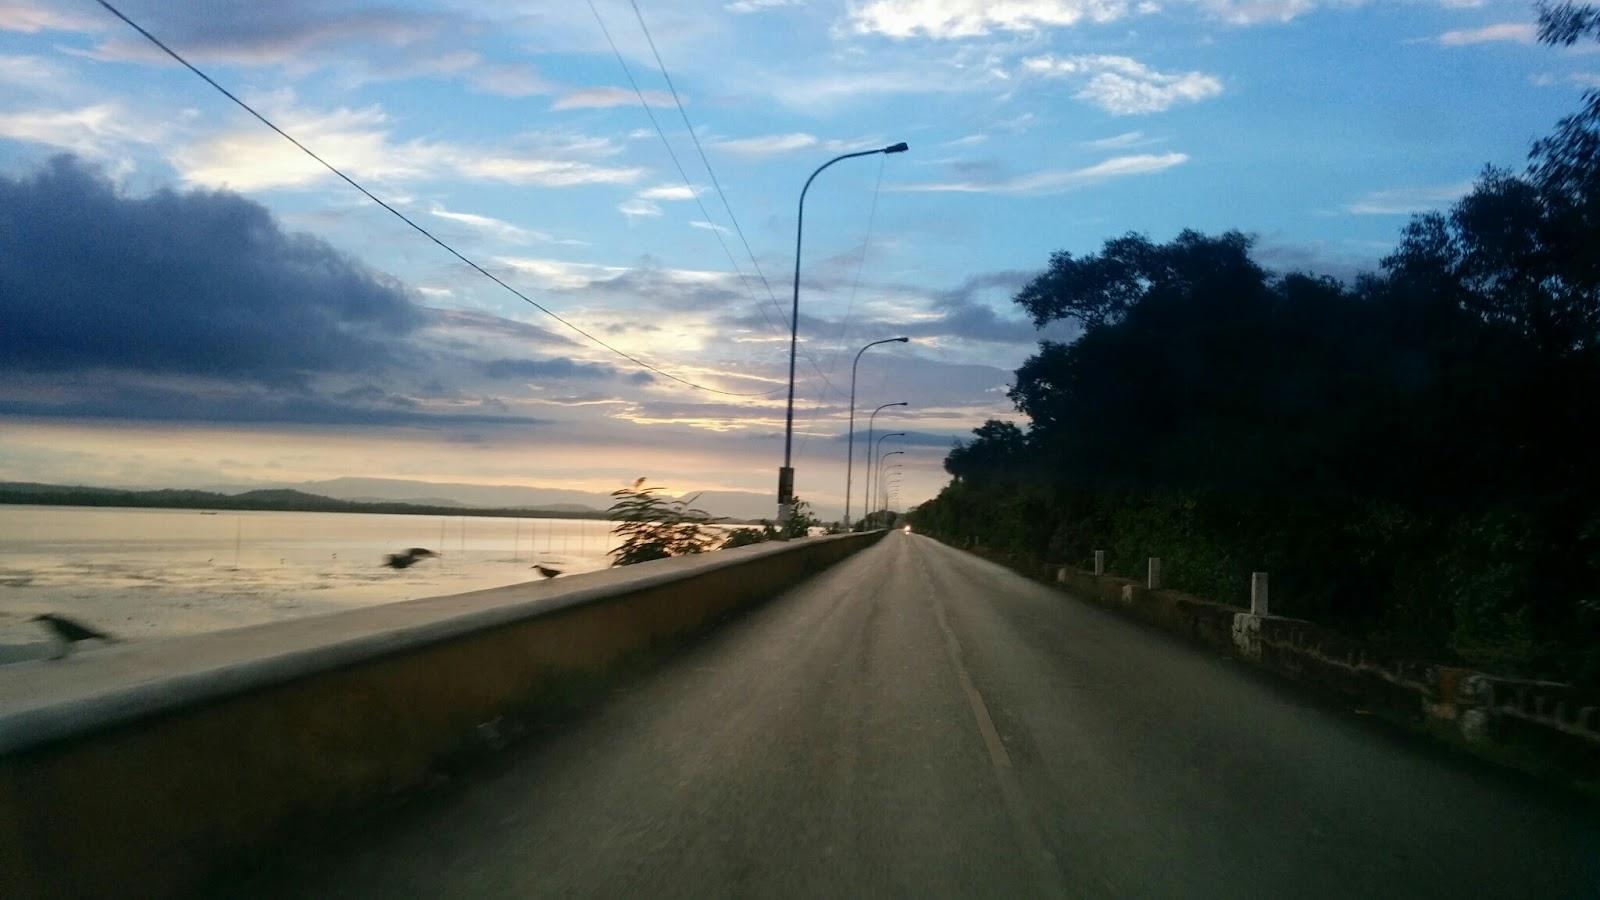 Driving along the Ribandar causeway.